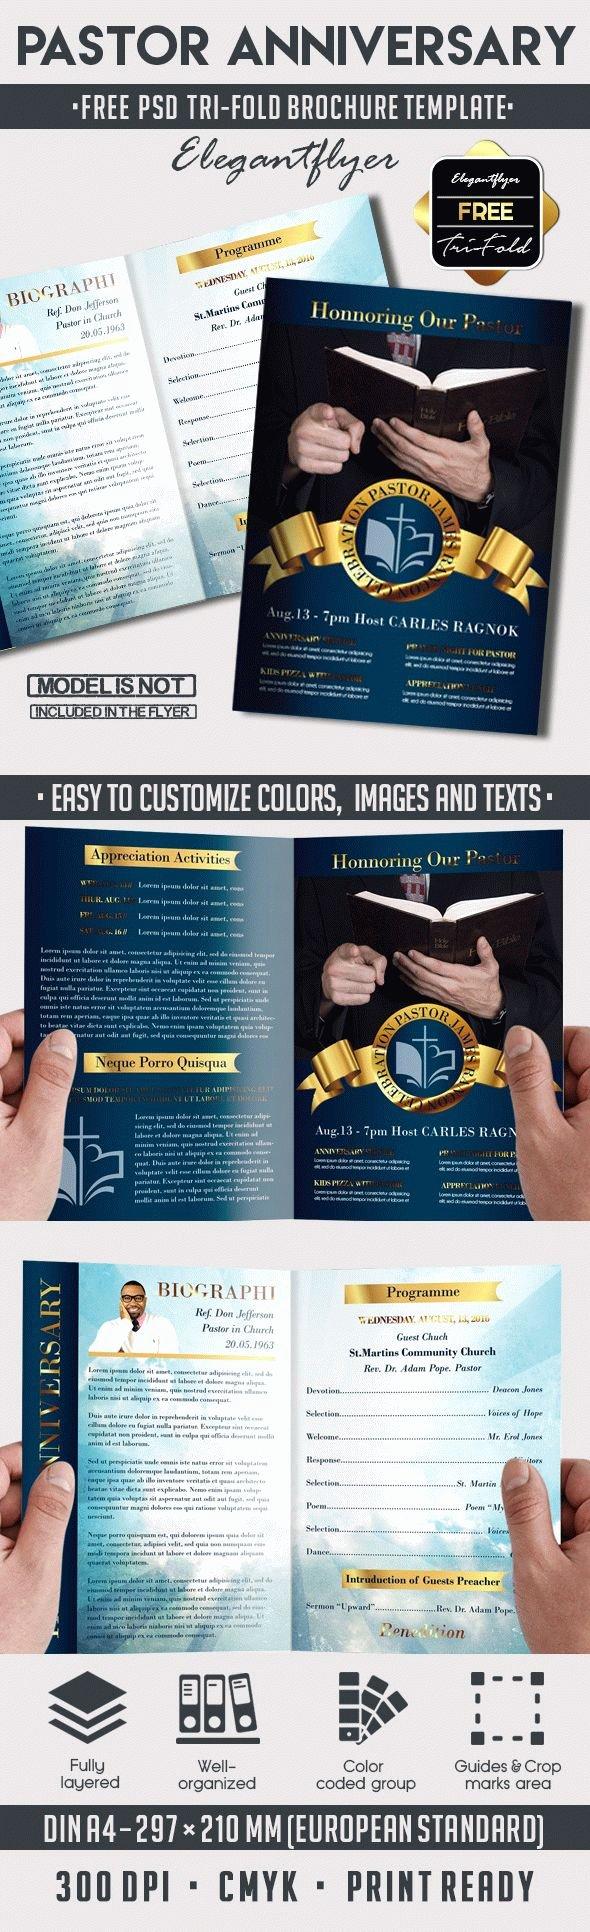 Pastor Anniversary Free Brochure Program – by Elegantflyer